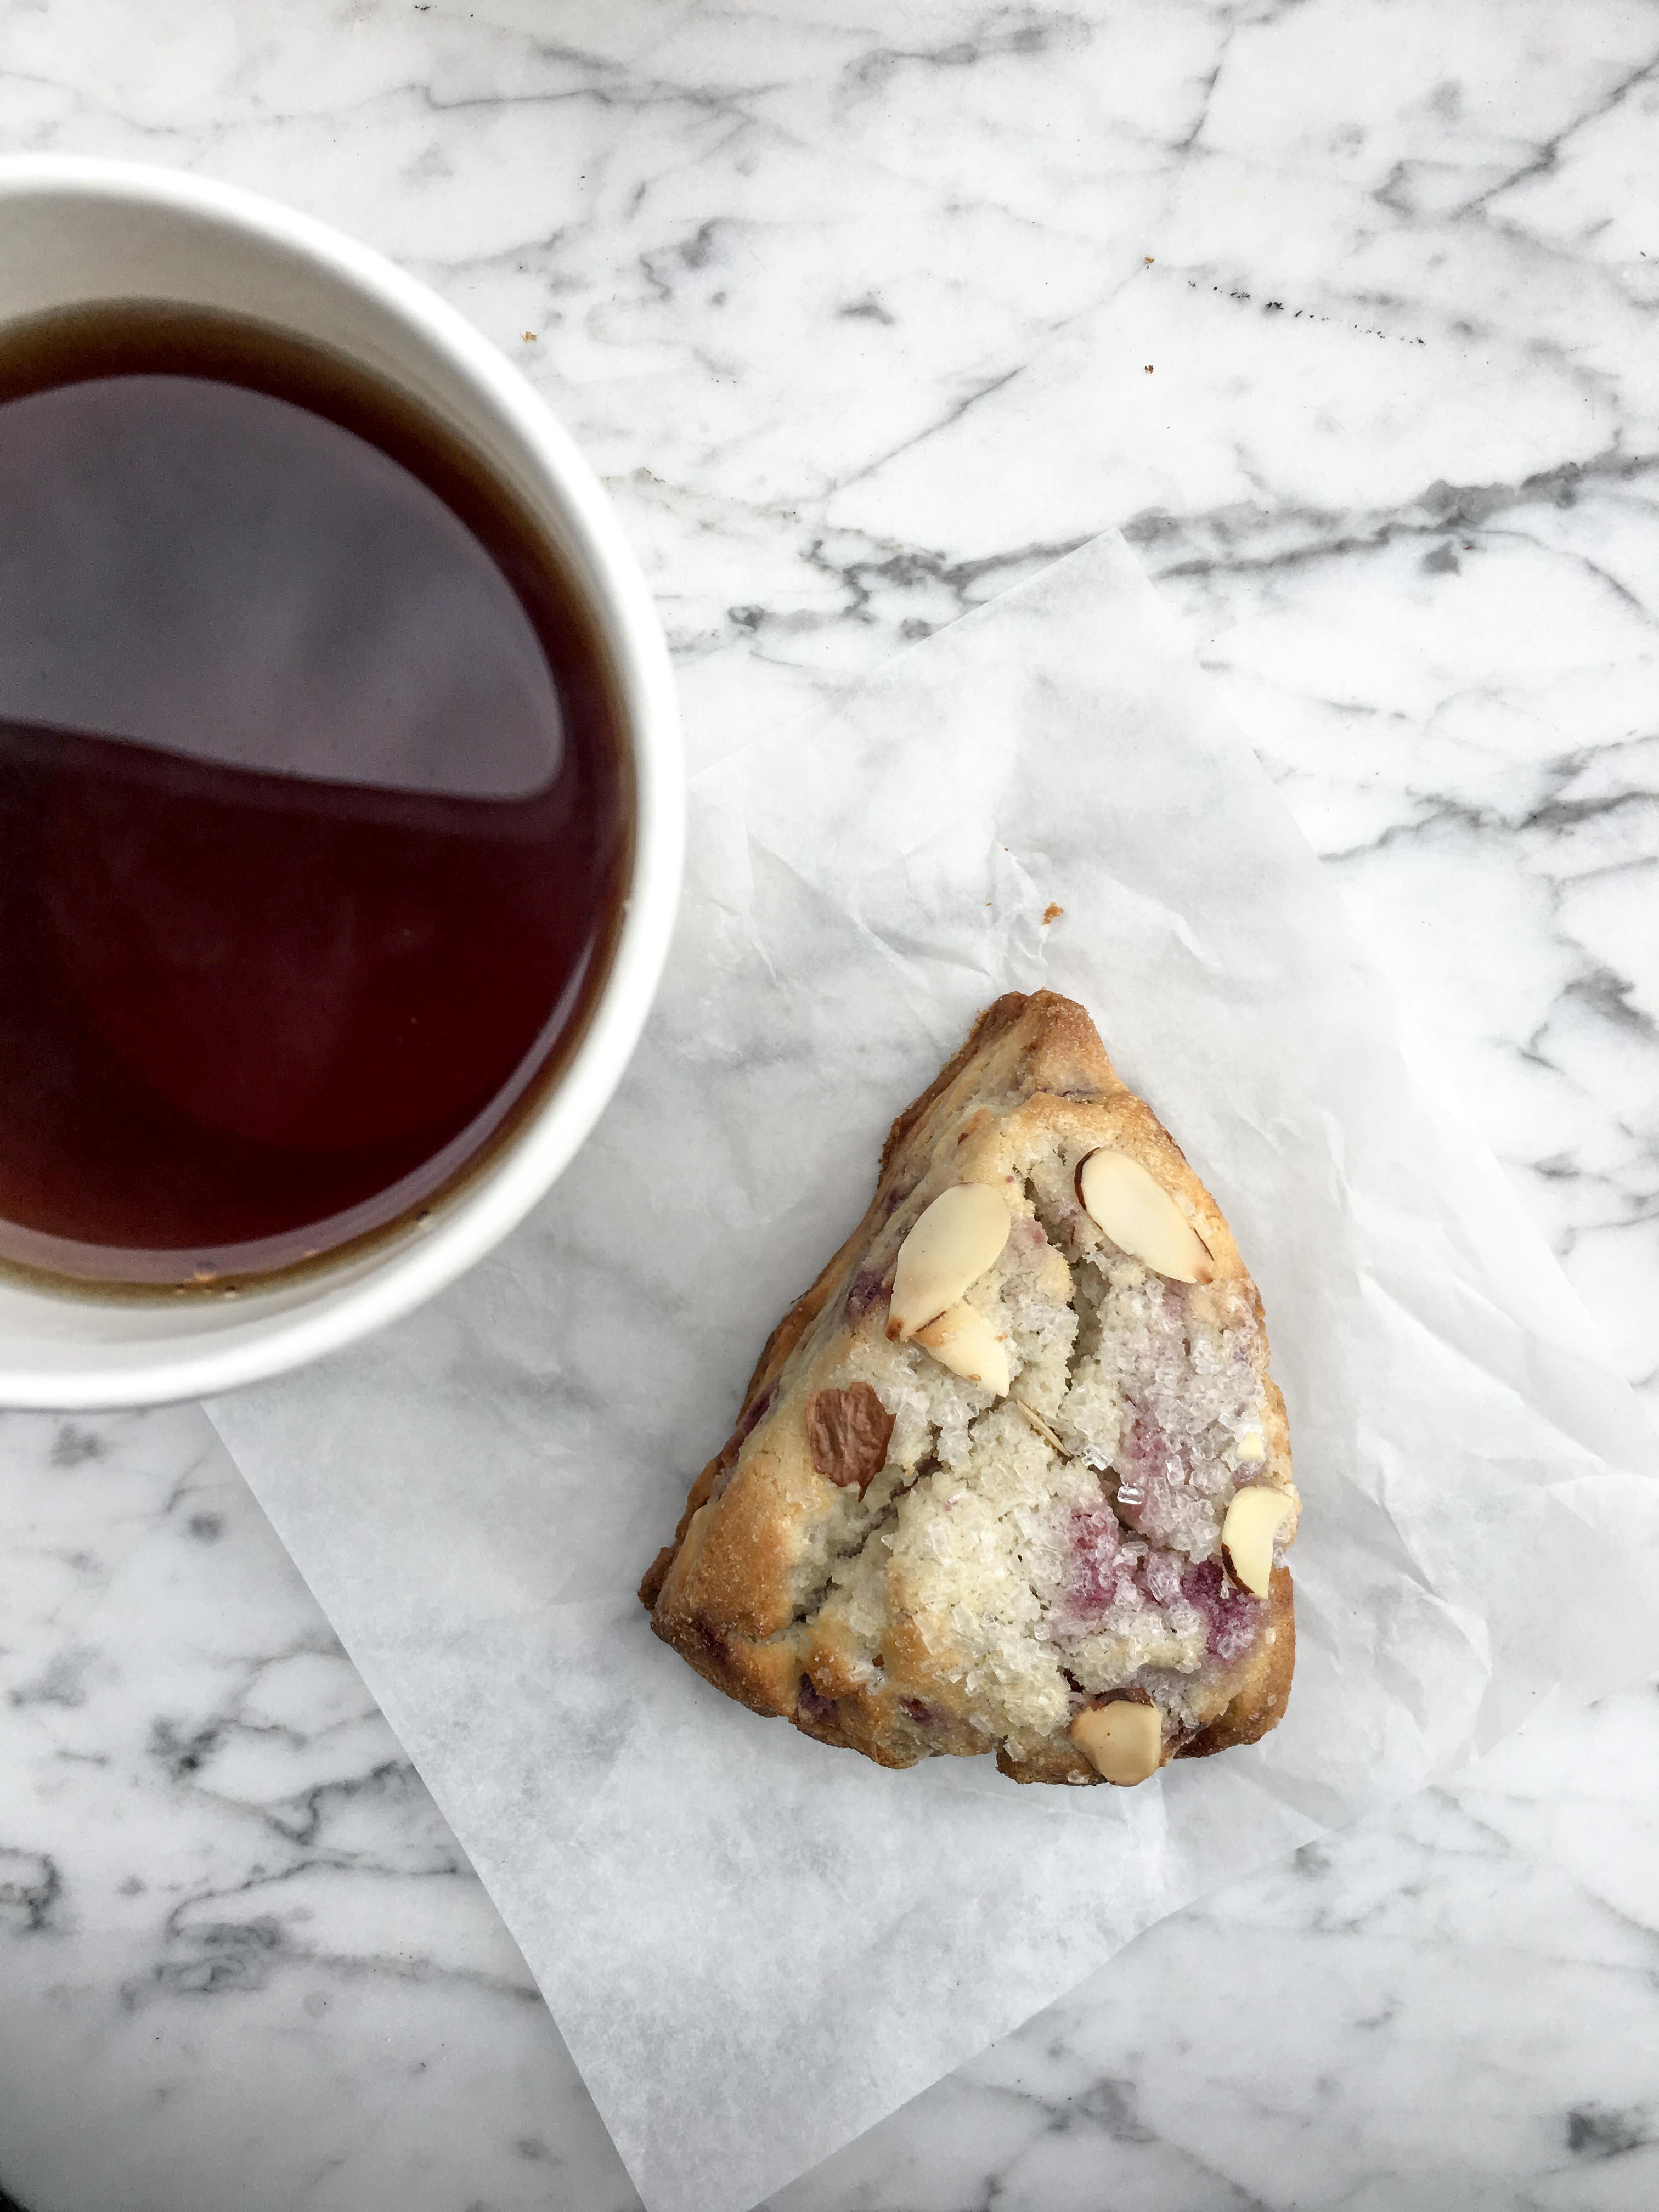 Raspberry Scone and Tea